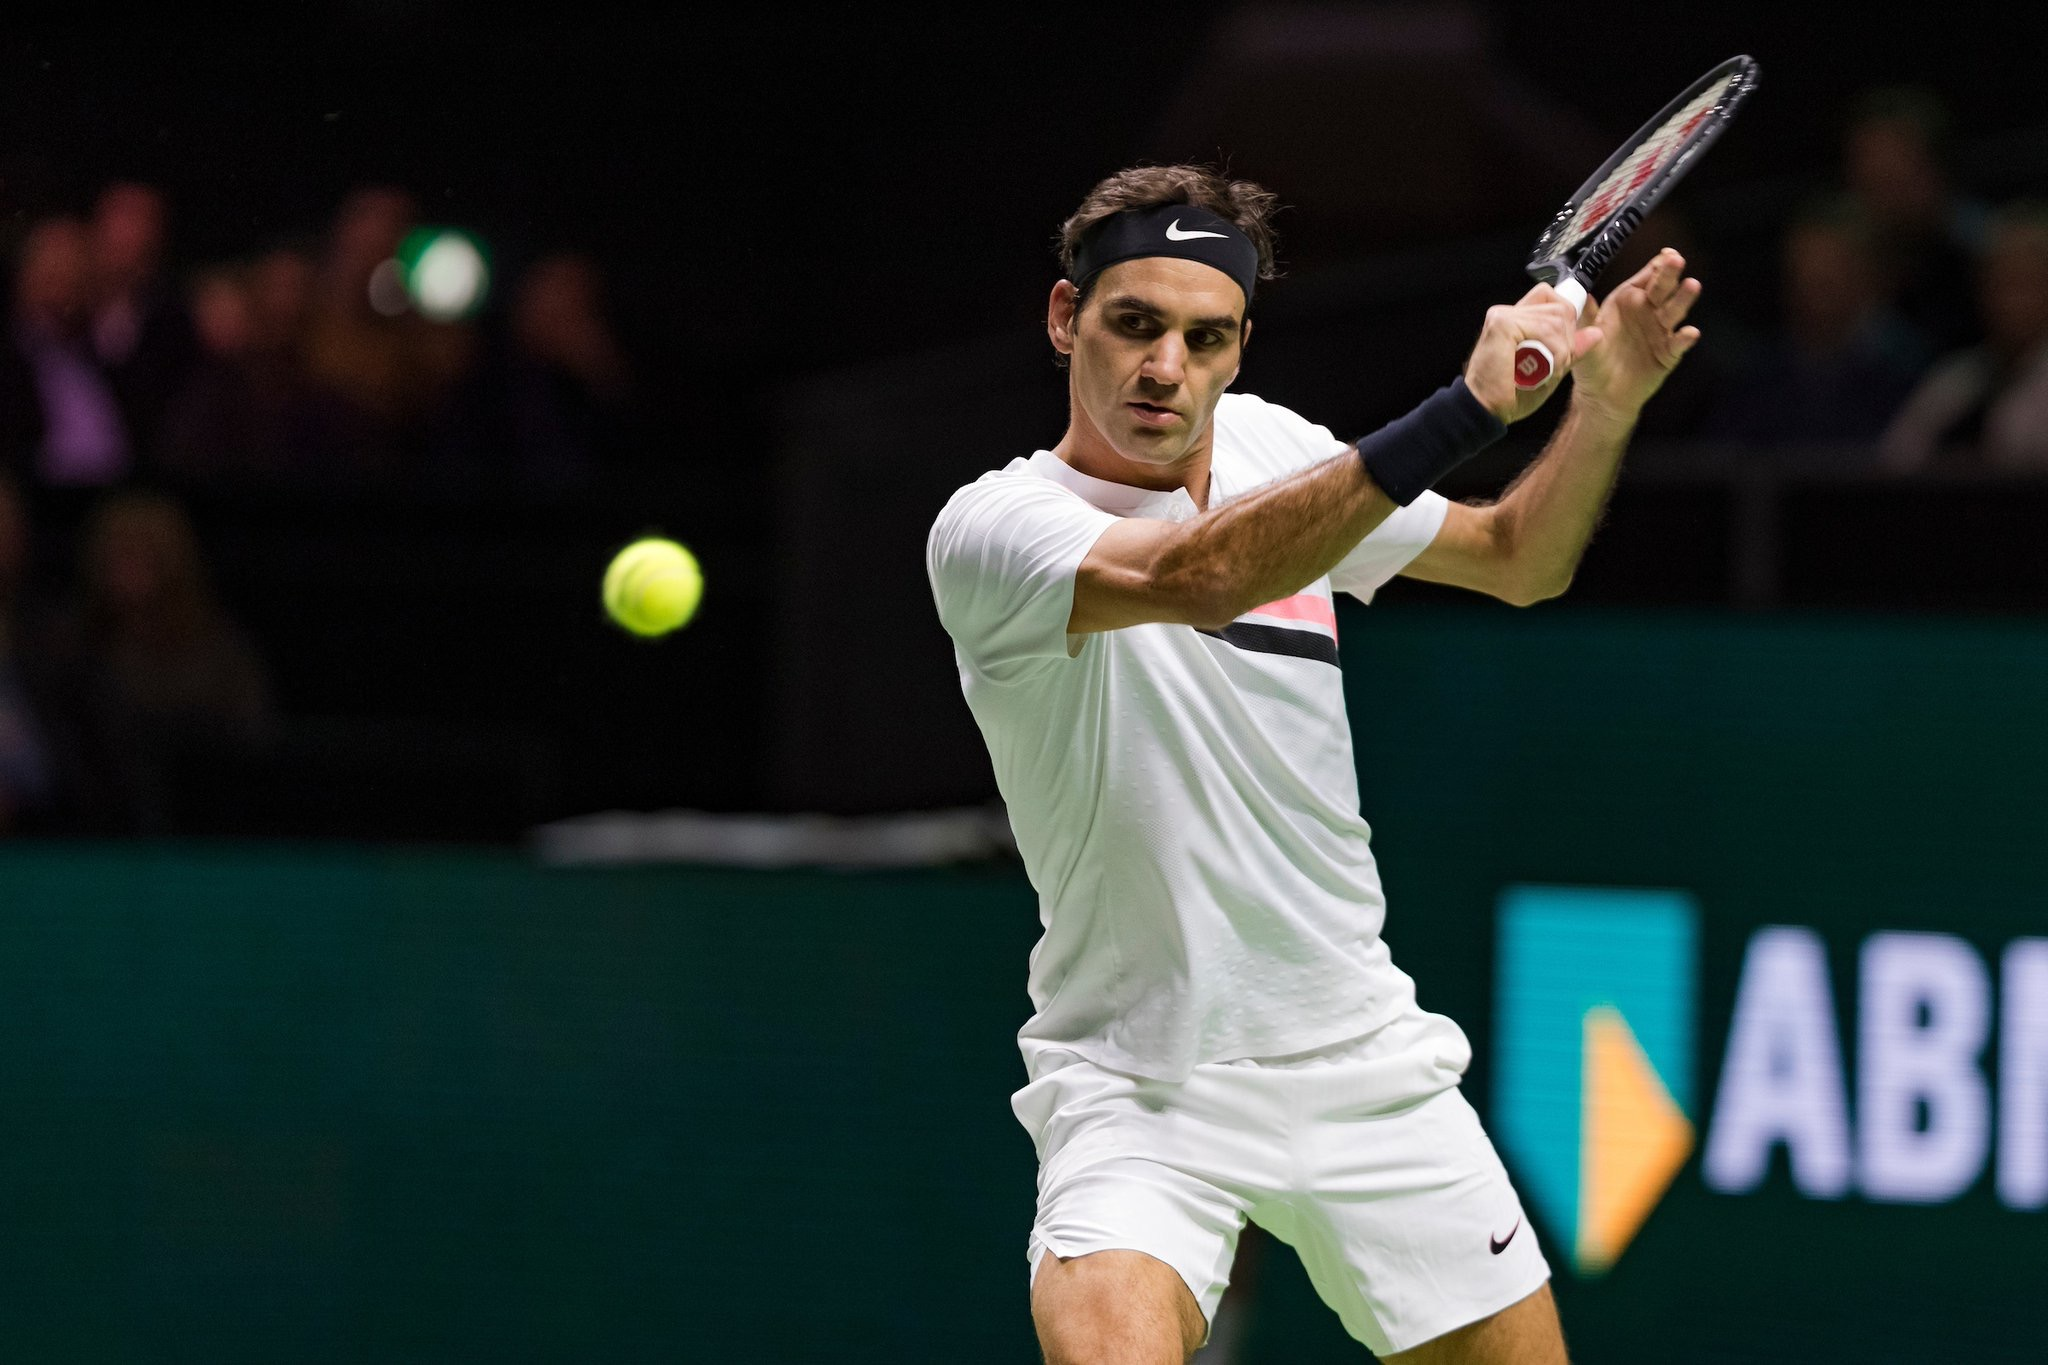 Roger Federer 2018 Rotterdam Open - ABN AMRO World Tennis Tournament - Federer Cruises to 97th Career Title in Rotterdam